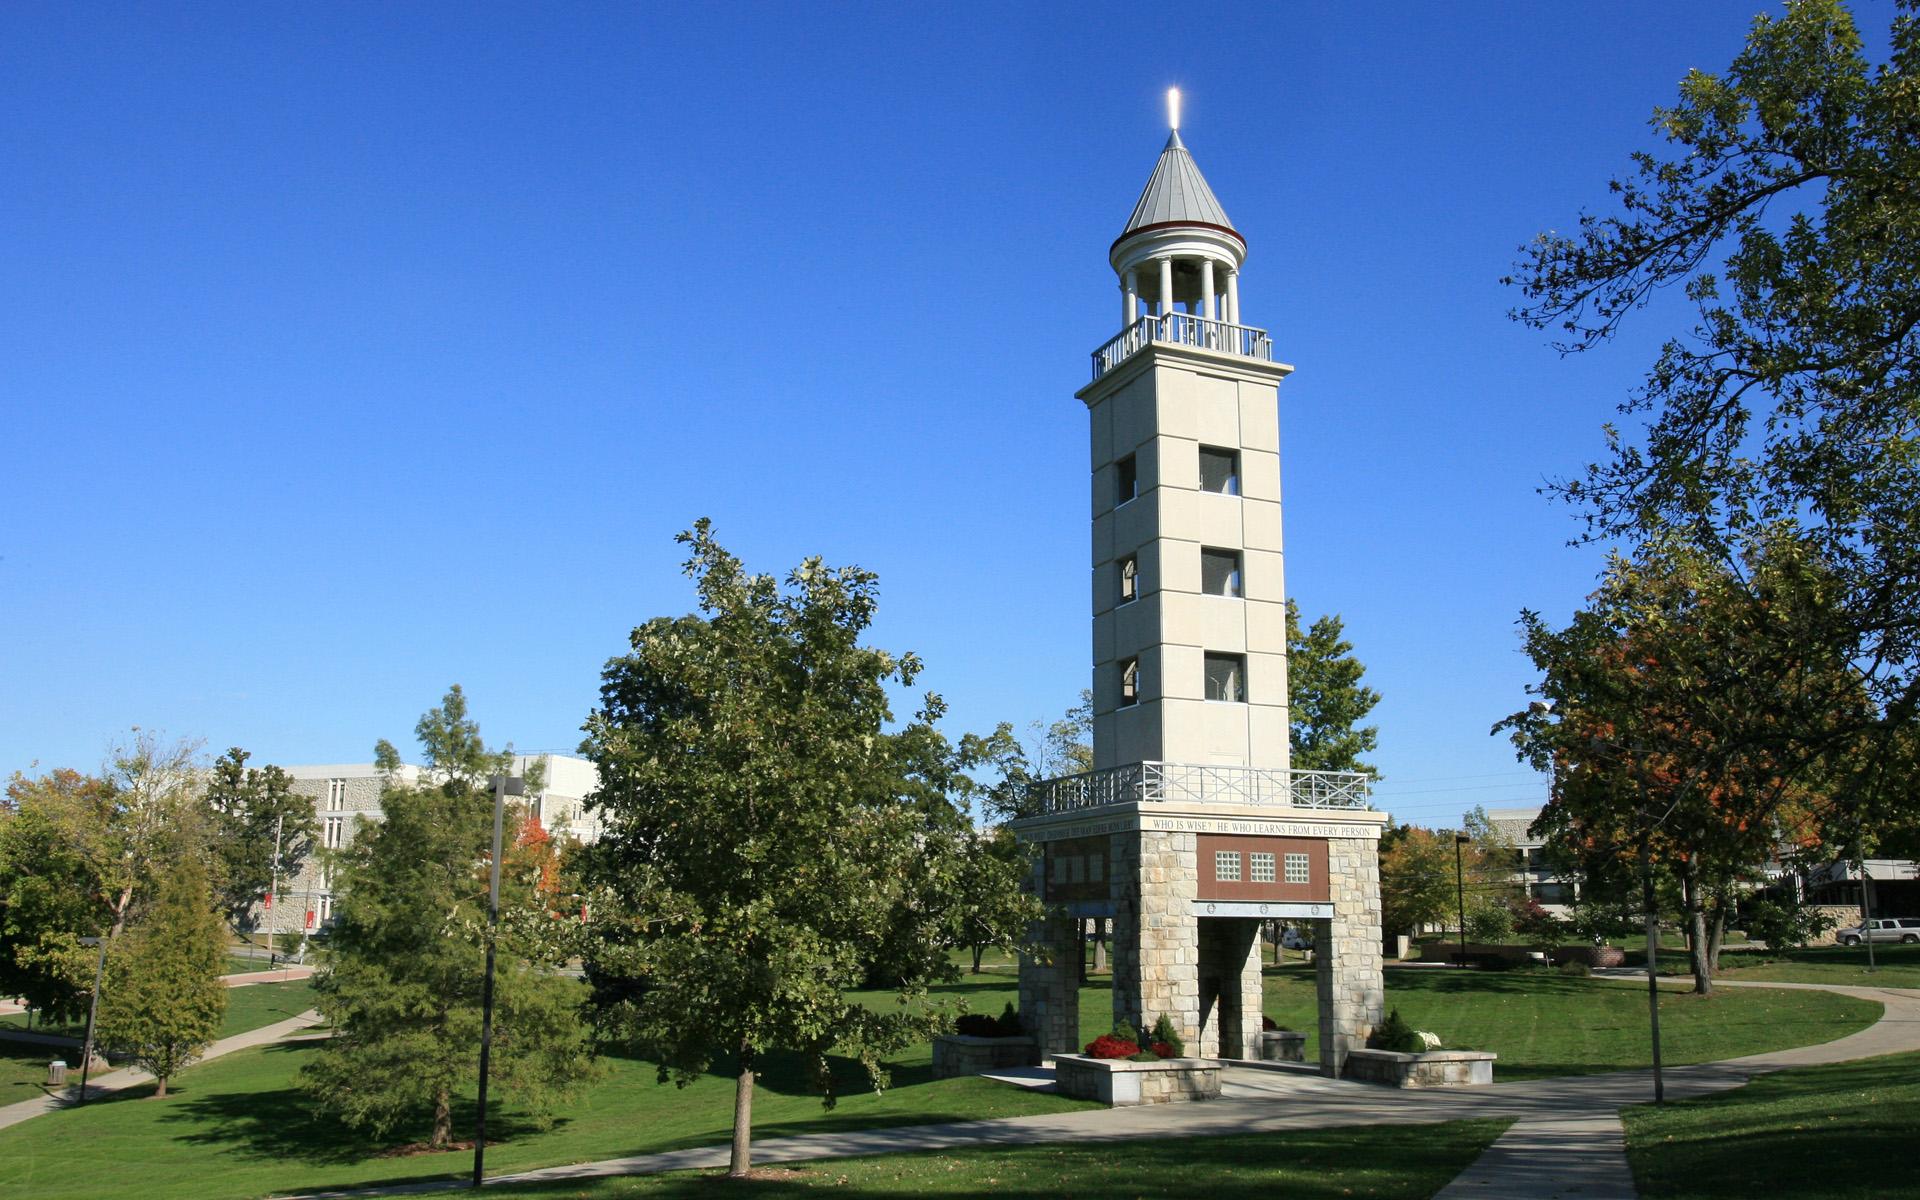 School Spirit University of Central Missouri 1920x1200